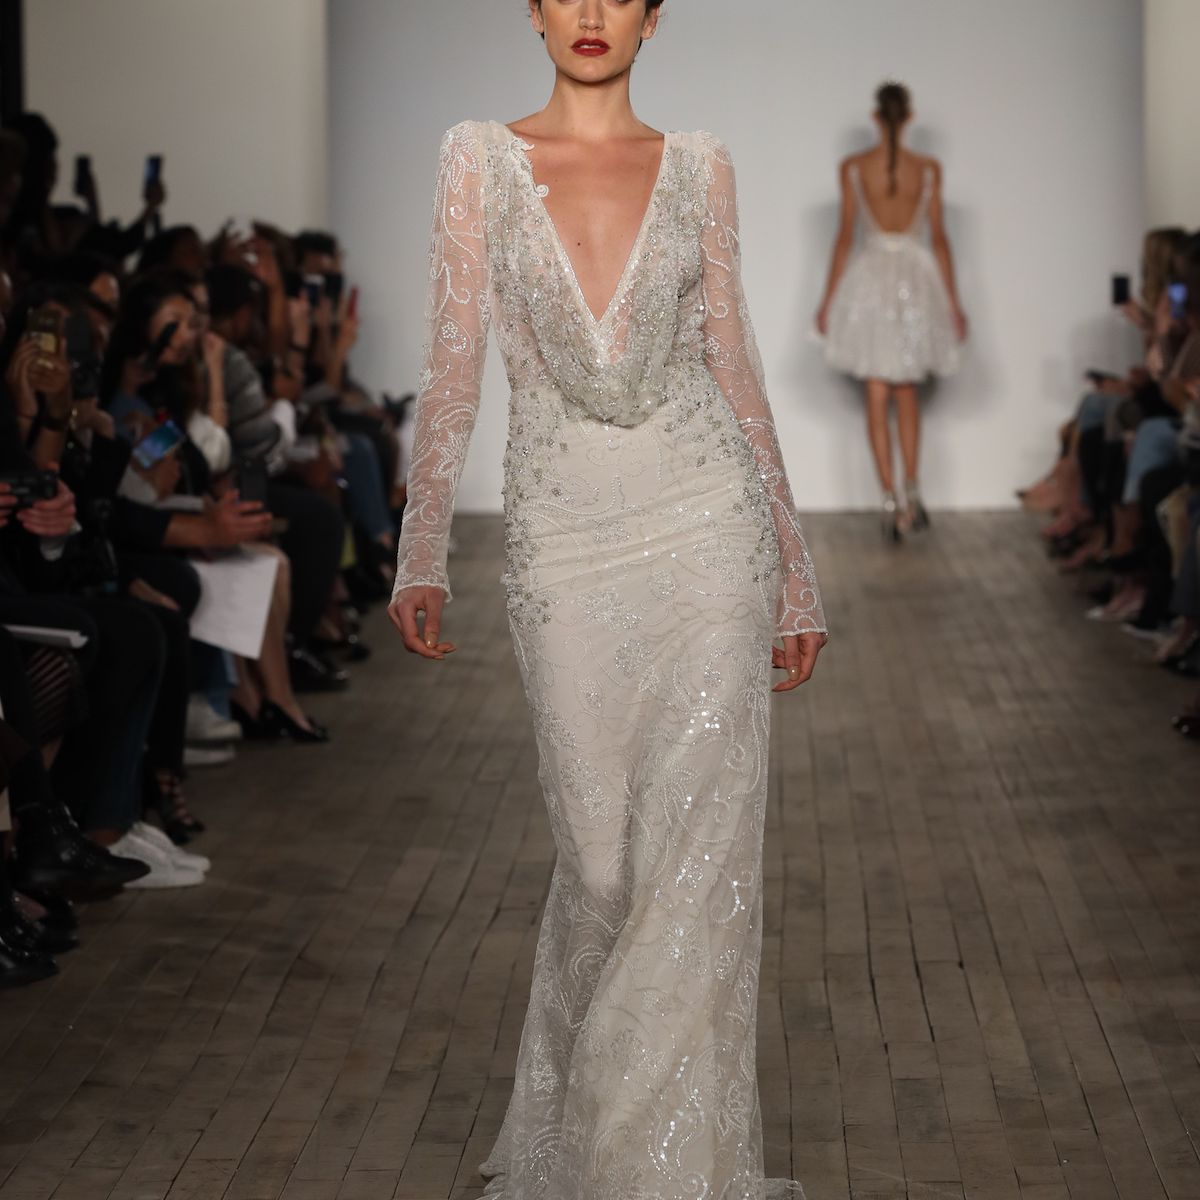 Model in deep V-cut cowl neck wedding dress